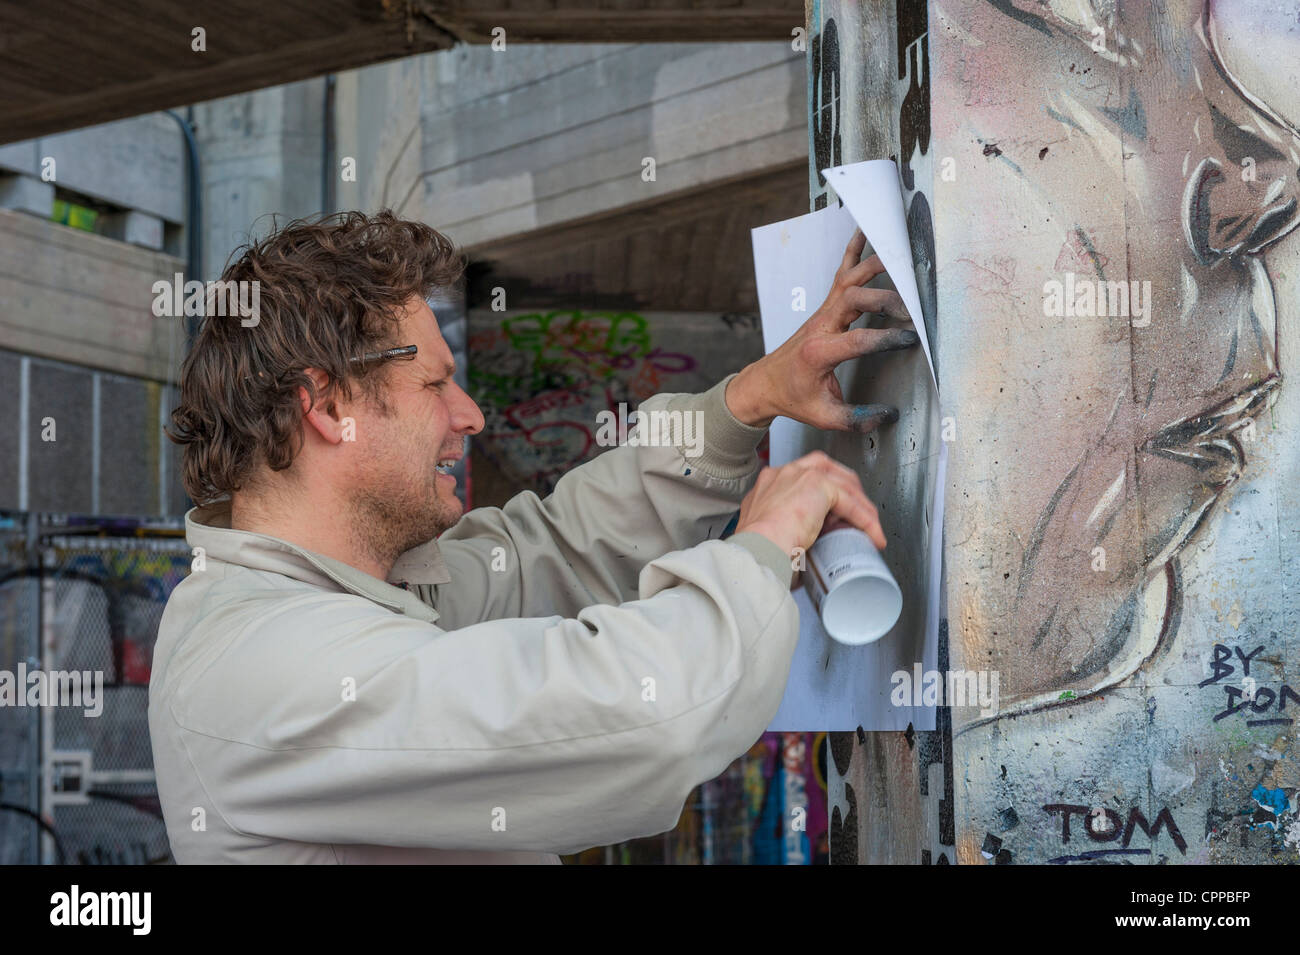 London , Southbank , Riverside , Embankment , street artist Don spray can painting graffiti mural picture black - Stock Image